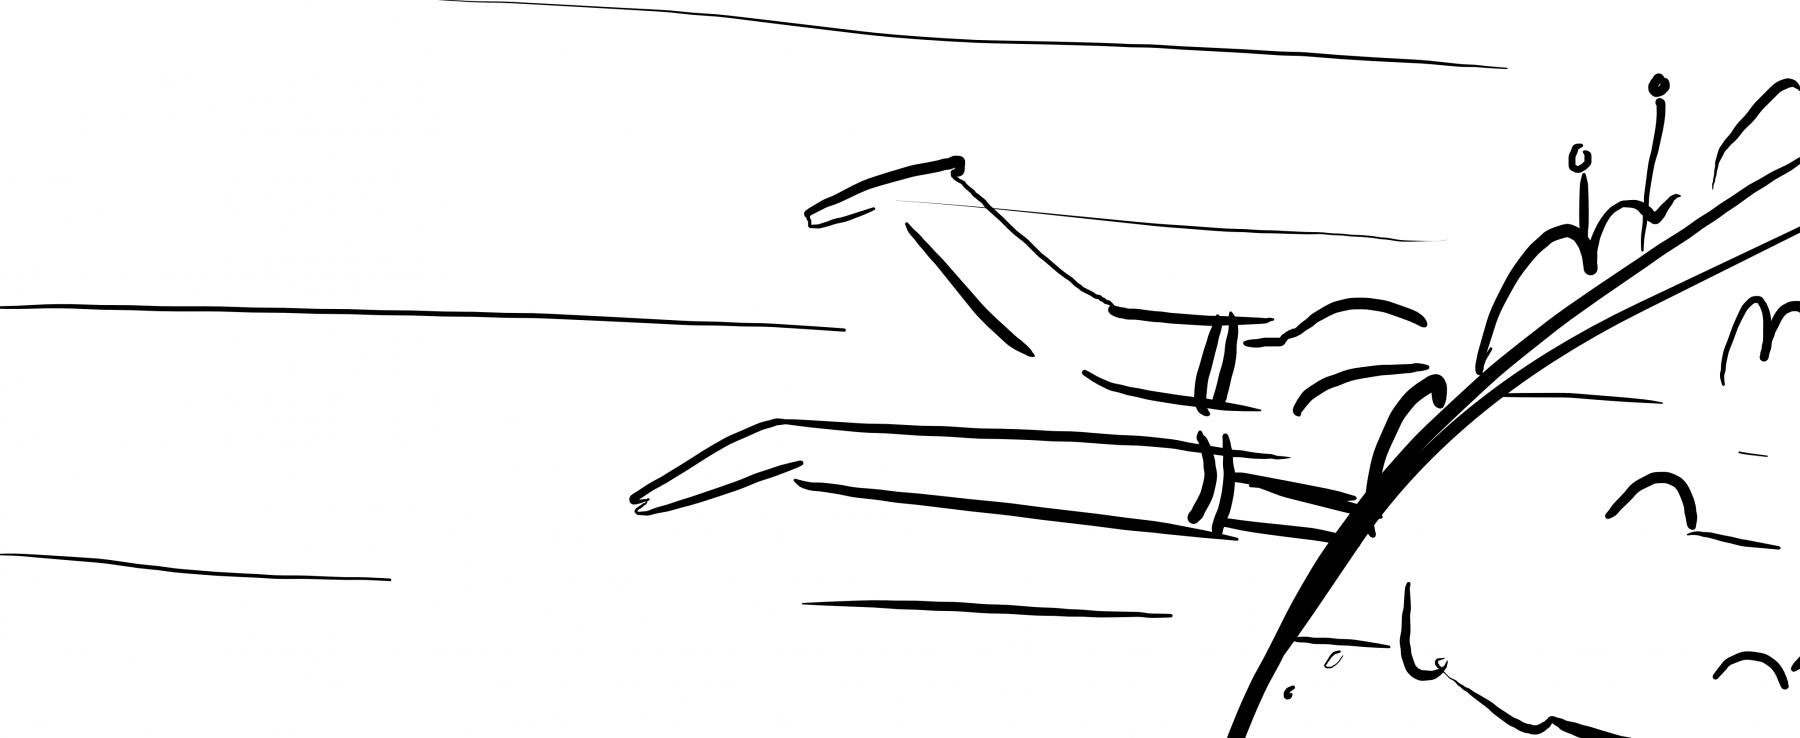 Nut-Thumbnail-Rough-Board00288